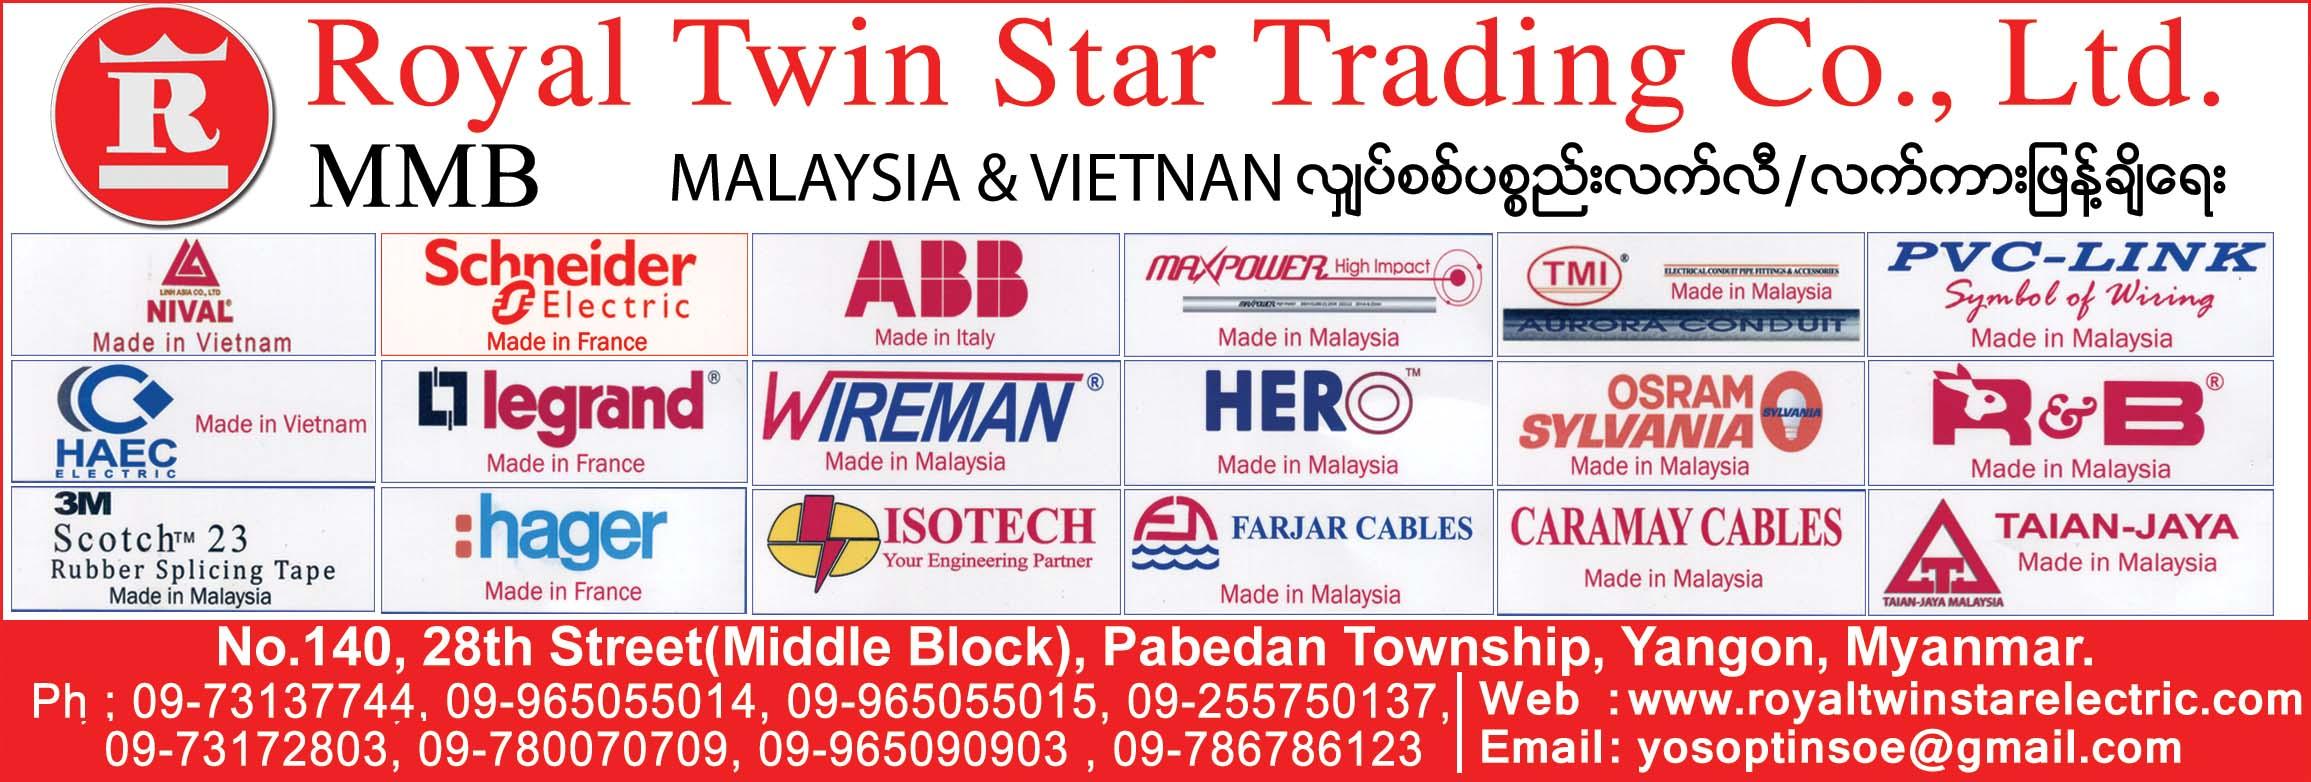 Royal Twin Star Trading Co., Ltd.